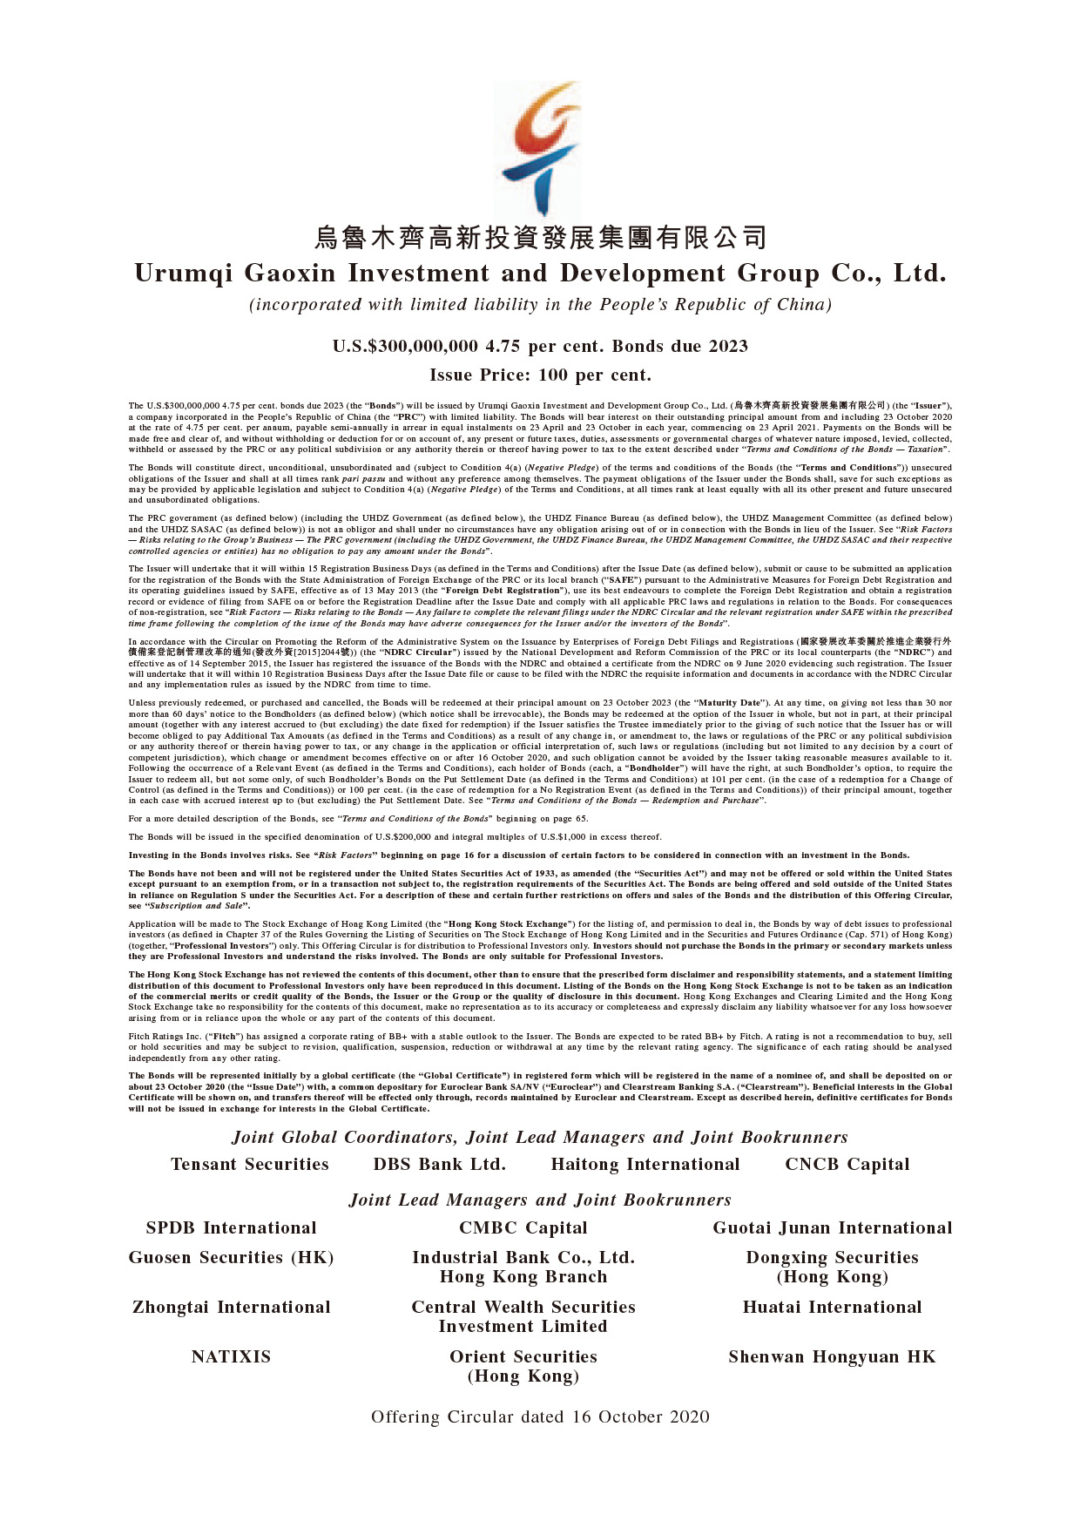 Urumqi Gaoxin Investment and Development Group Co., Ltd.